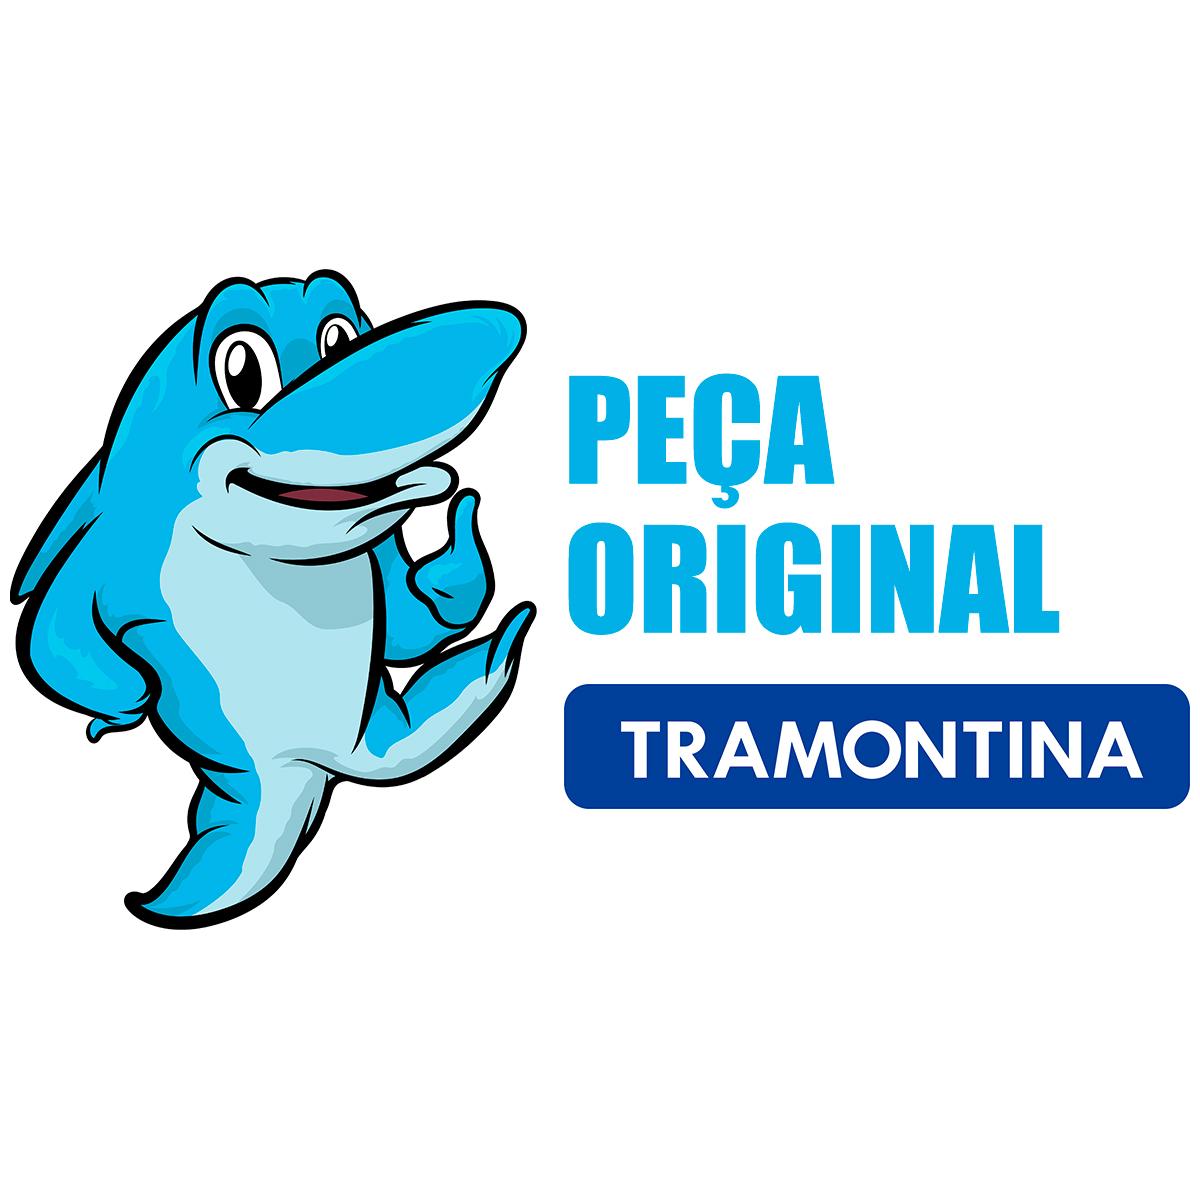 Conector de saída C/ By Pass P/ Lavadora Tramontina 1500psi 1200w, 1600psi 1400w Original